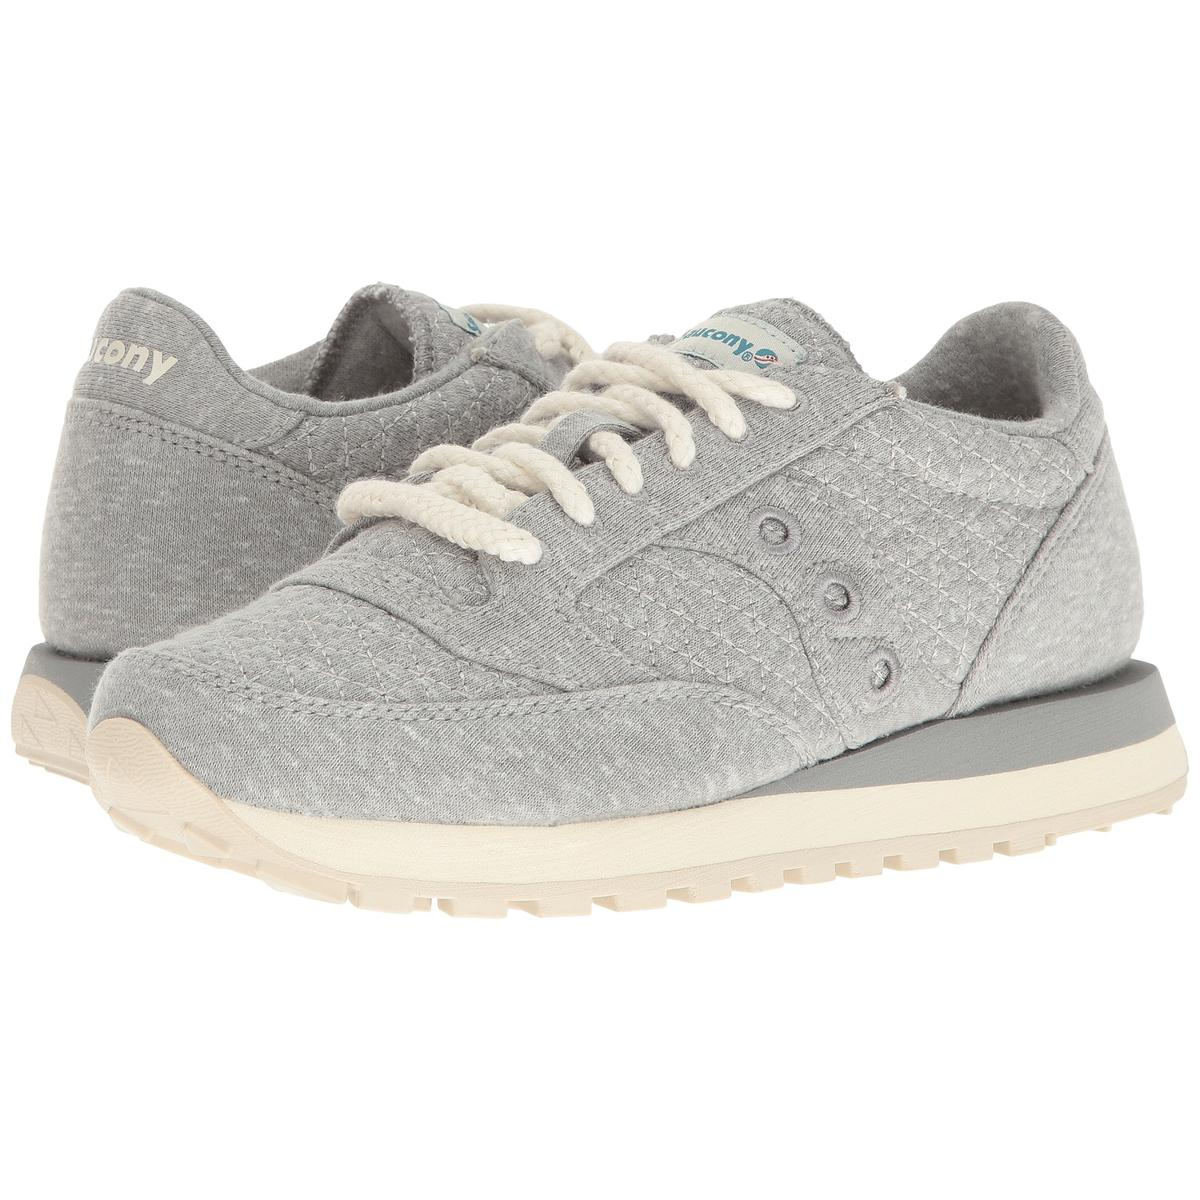 Saucony Jazz Original Womens Grey Sneakers by Saucony